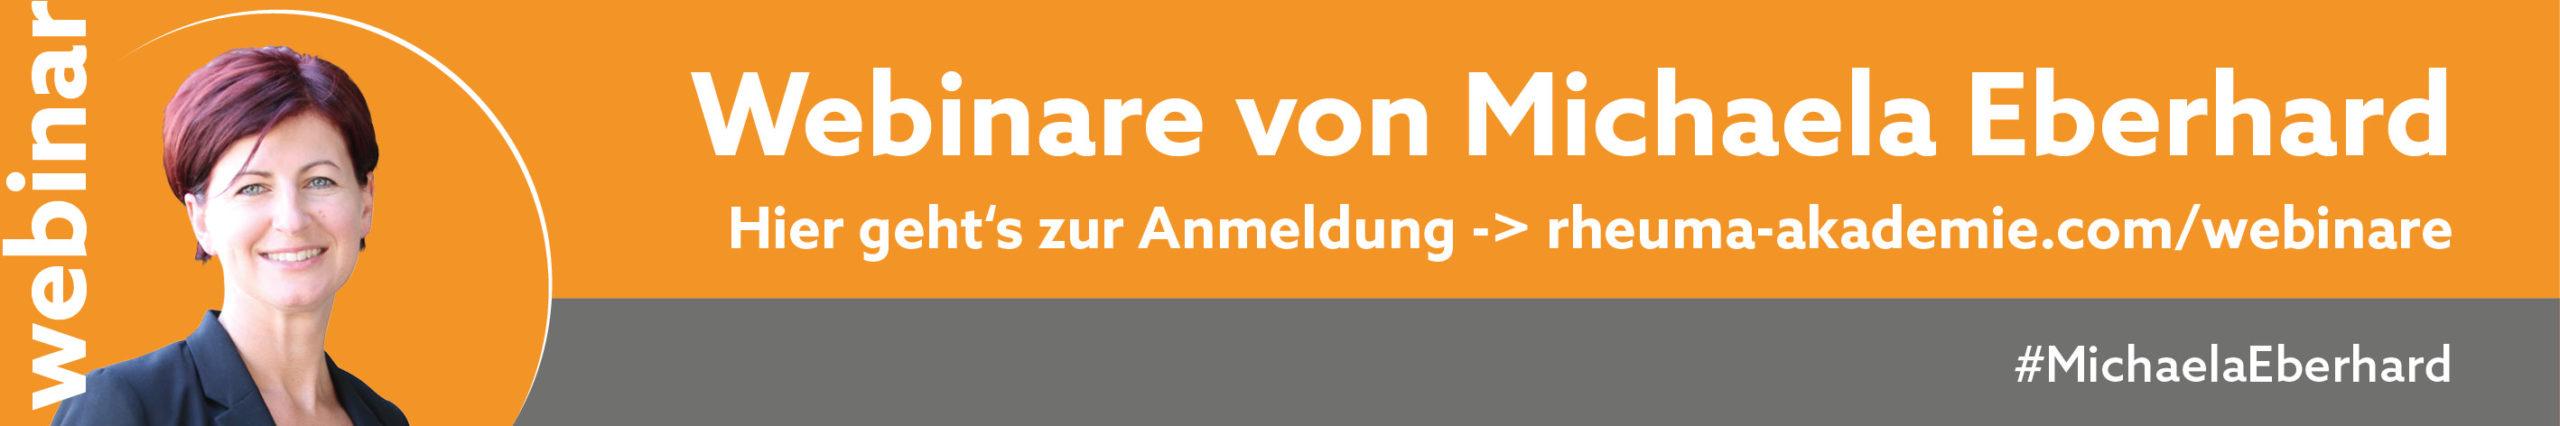 Banner Webinare Rheuma Akademie